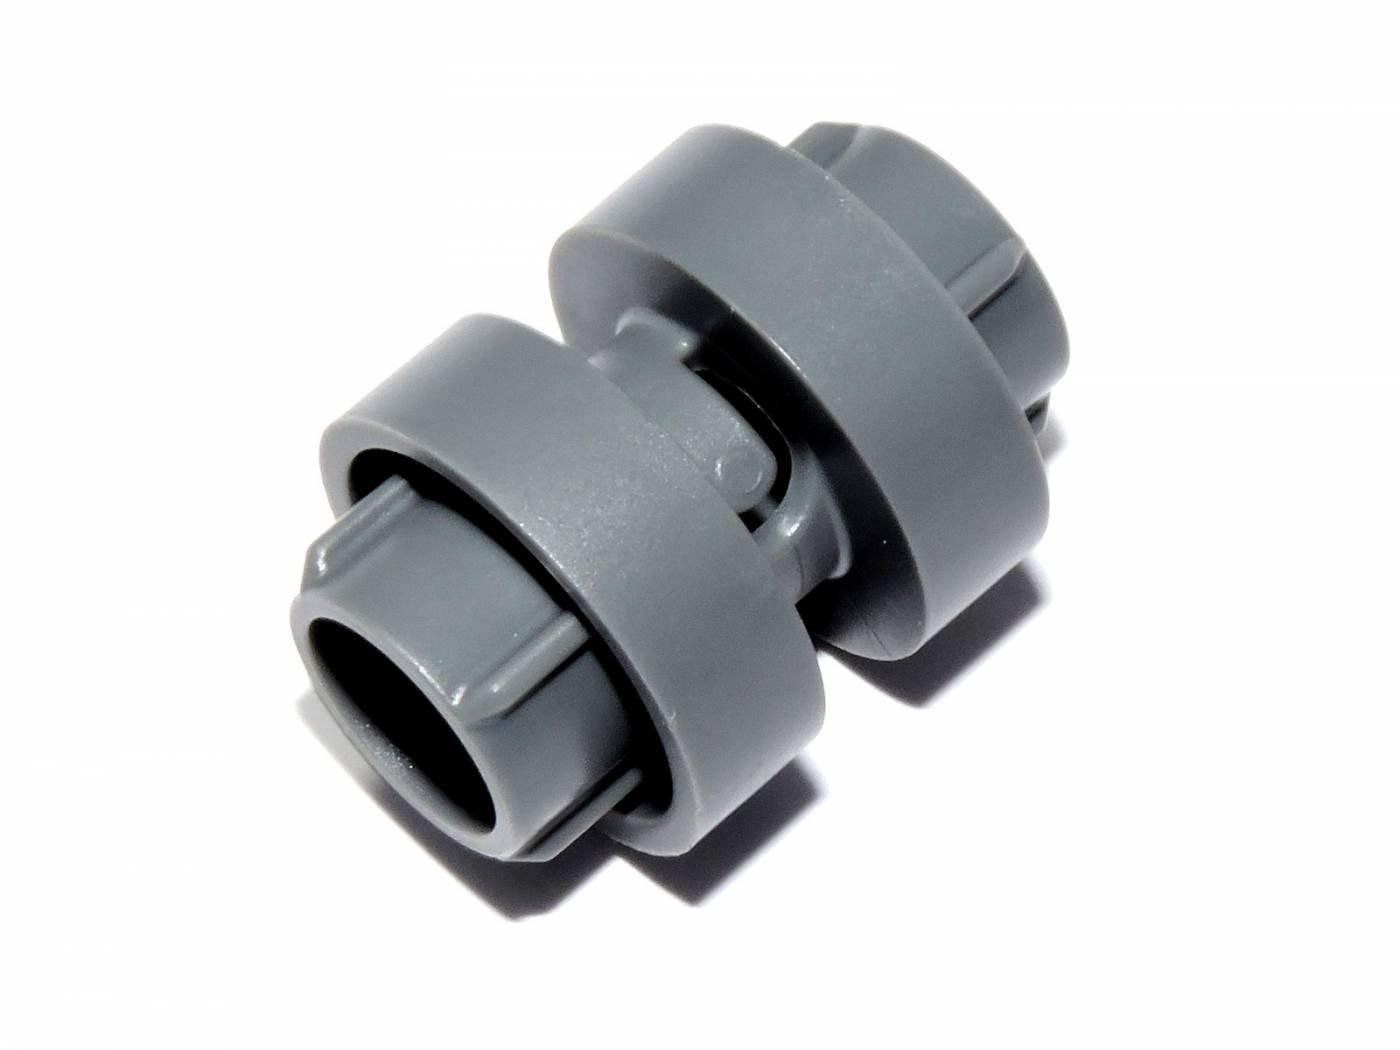 Lego Technic Transmission Drive Ring Cinza Escuro Pn 18947 Cn 6100931 Techbricks